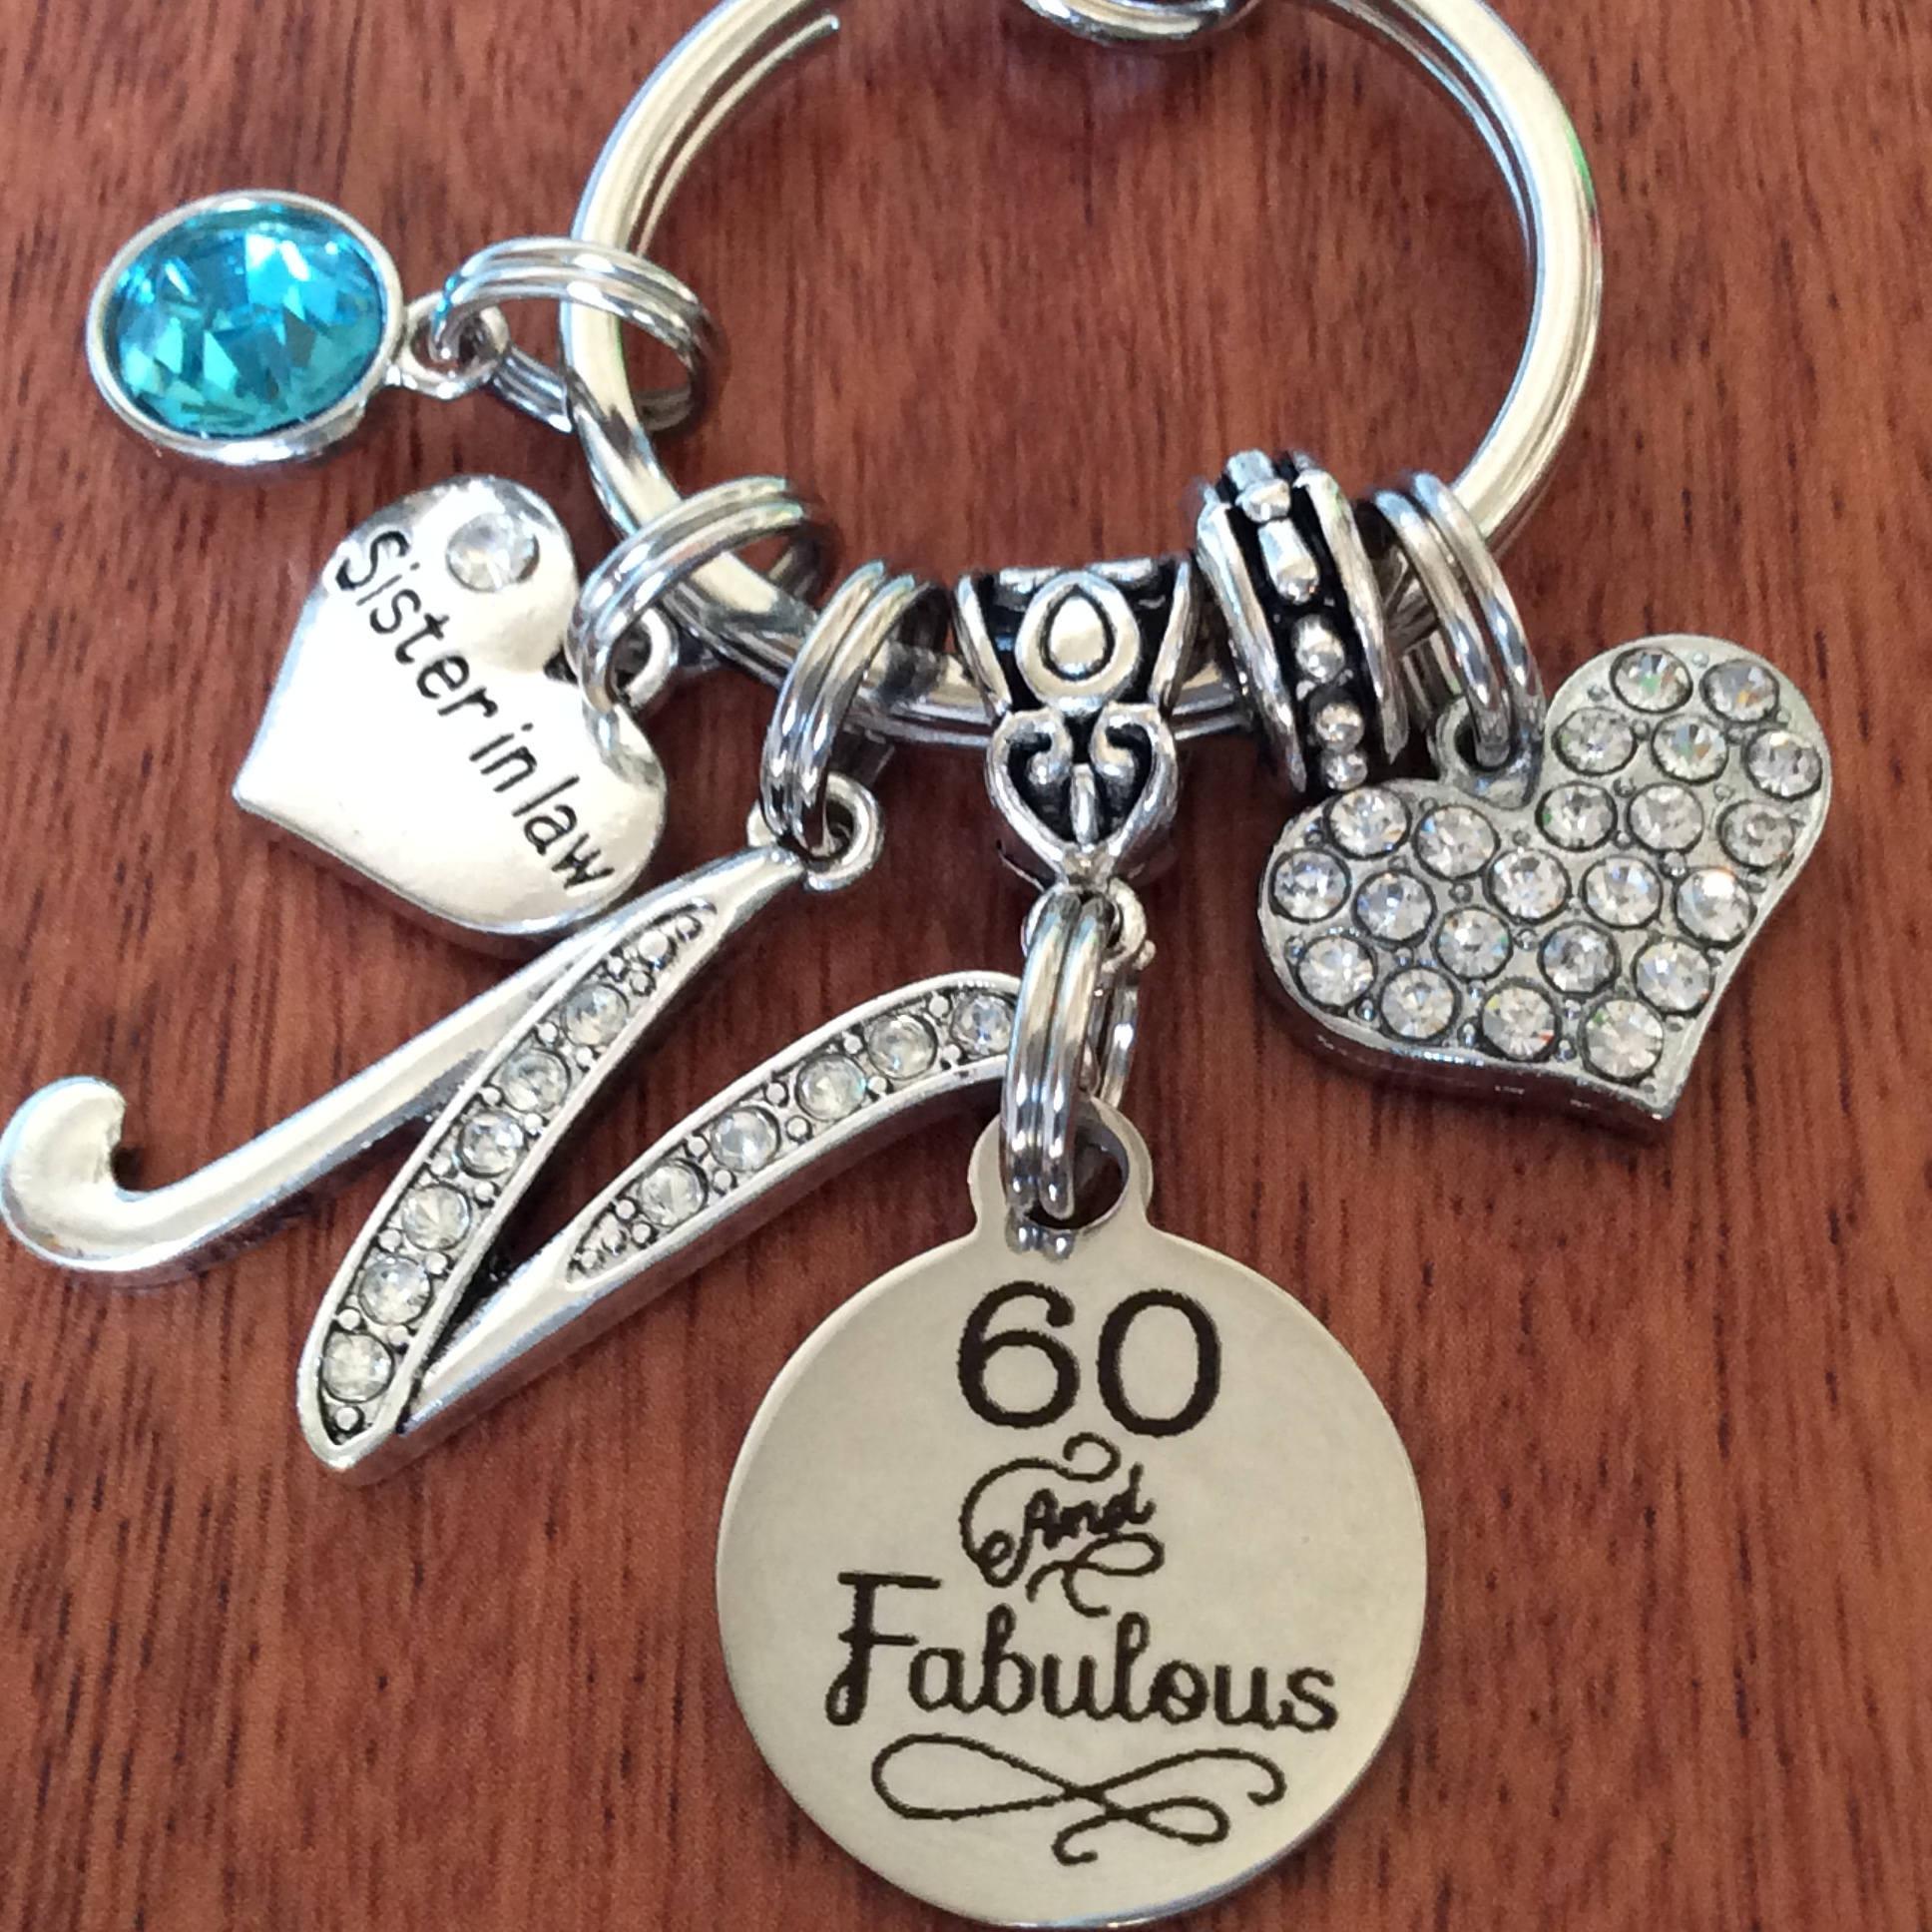 60Th Birthday Gift Ideas For.Women  60th Birthday 60th Birthday Gifts For Women 60th Birthday